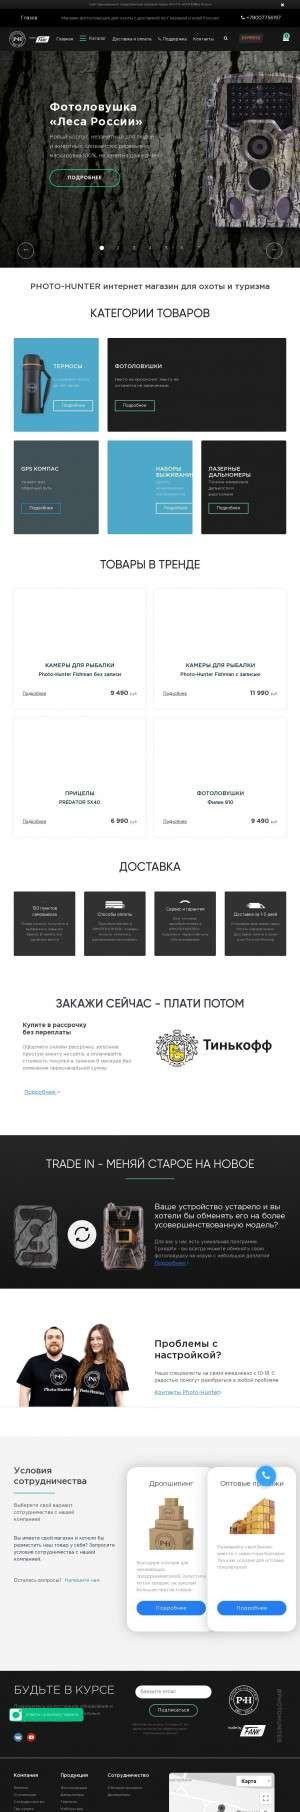 Предпросмотр для glazov.photo-hunter.org — Photo-Hunter